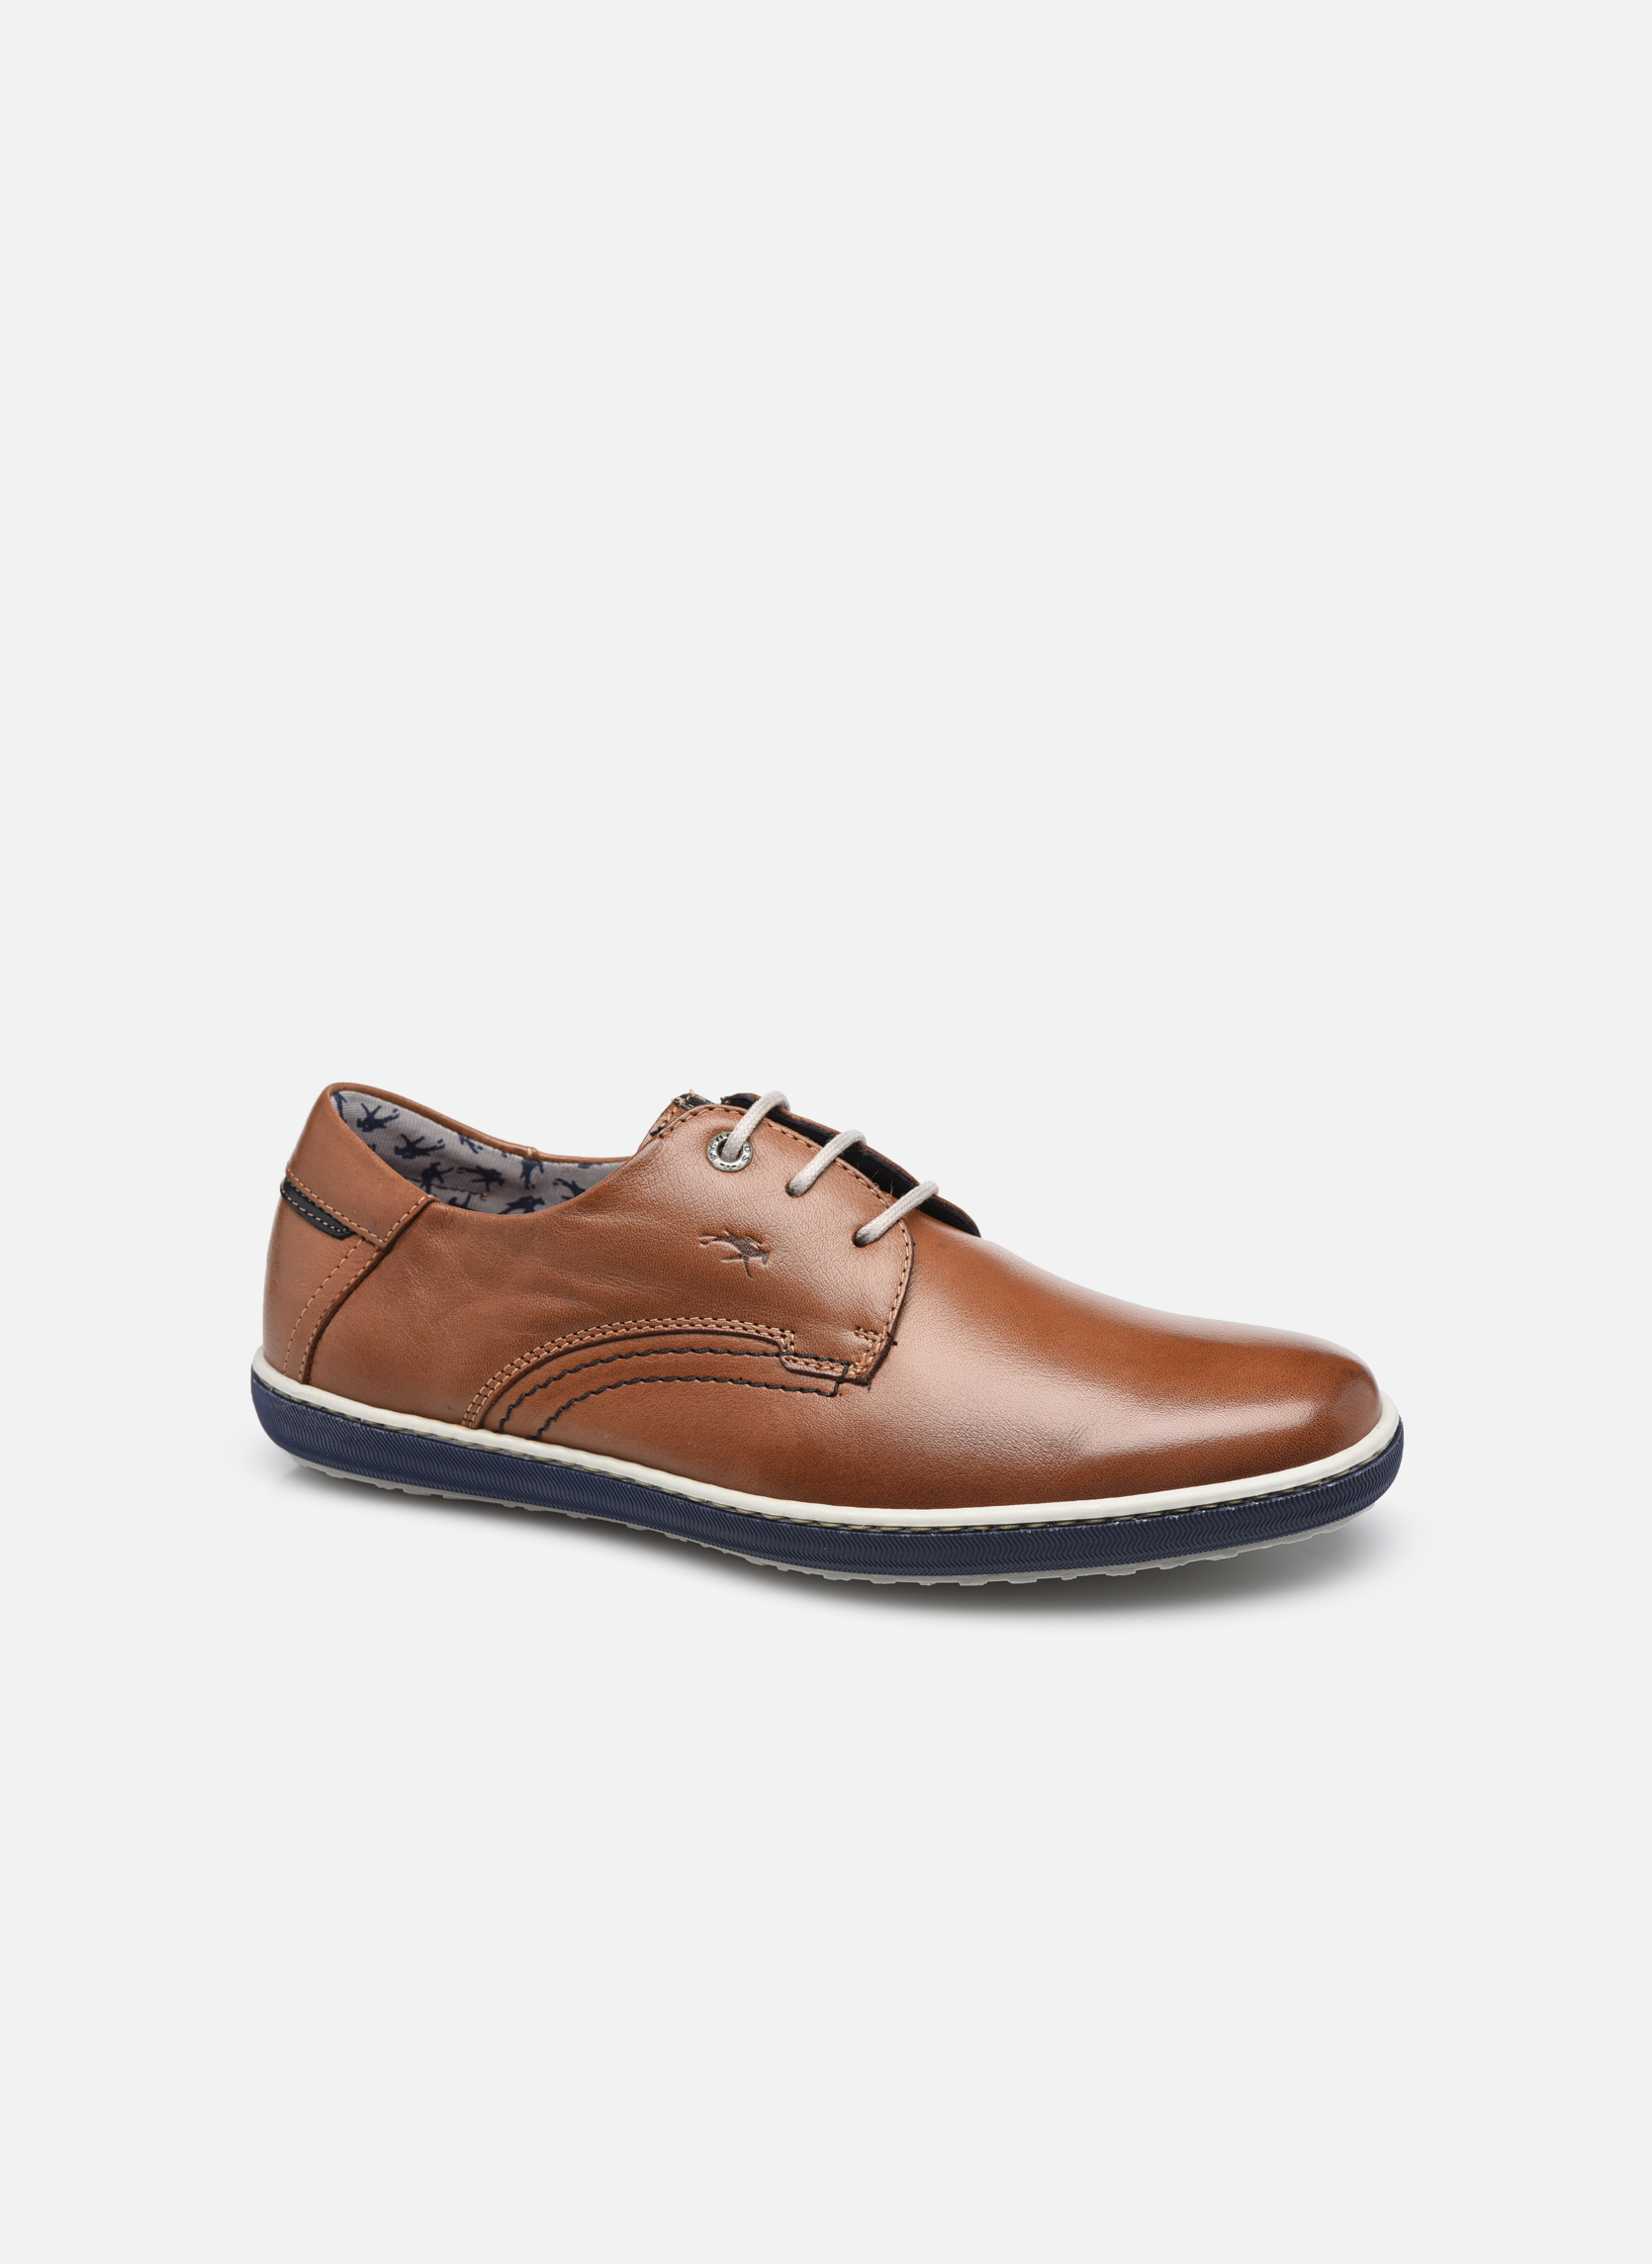 buy discount Fluchos Pegaso 9710 Brown Lace up shoes 284634 Mens Cuero Fluchos Mens Lace up shoes